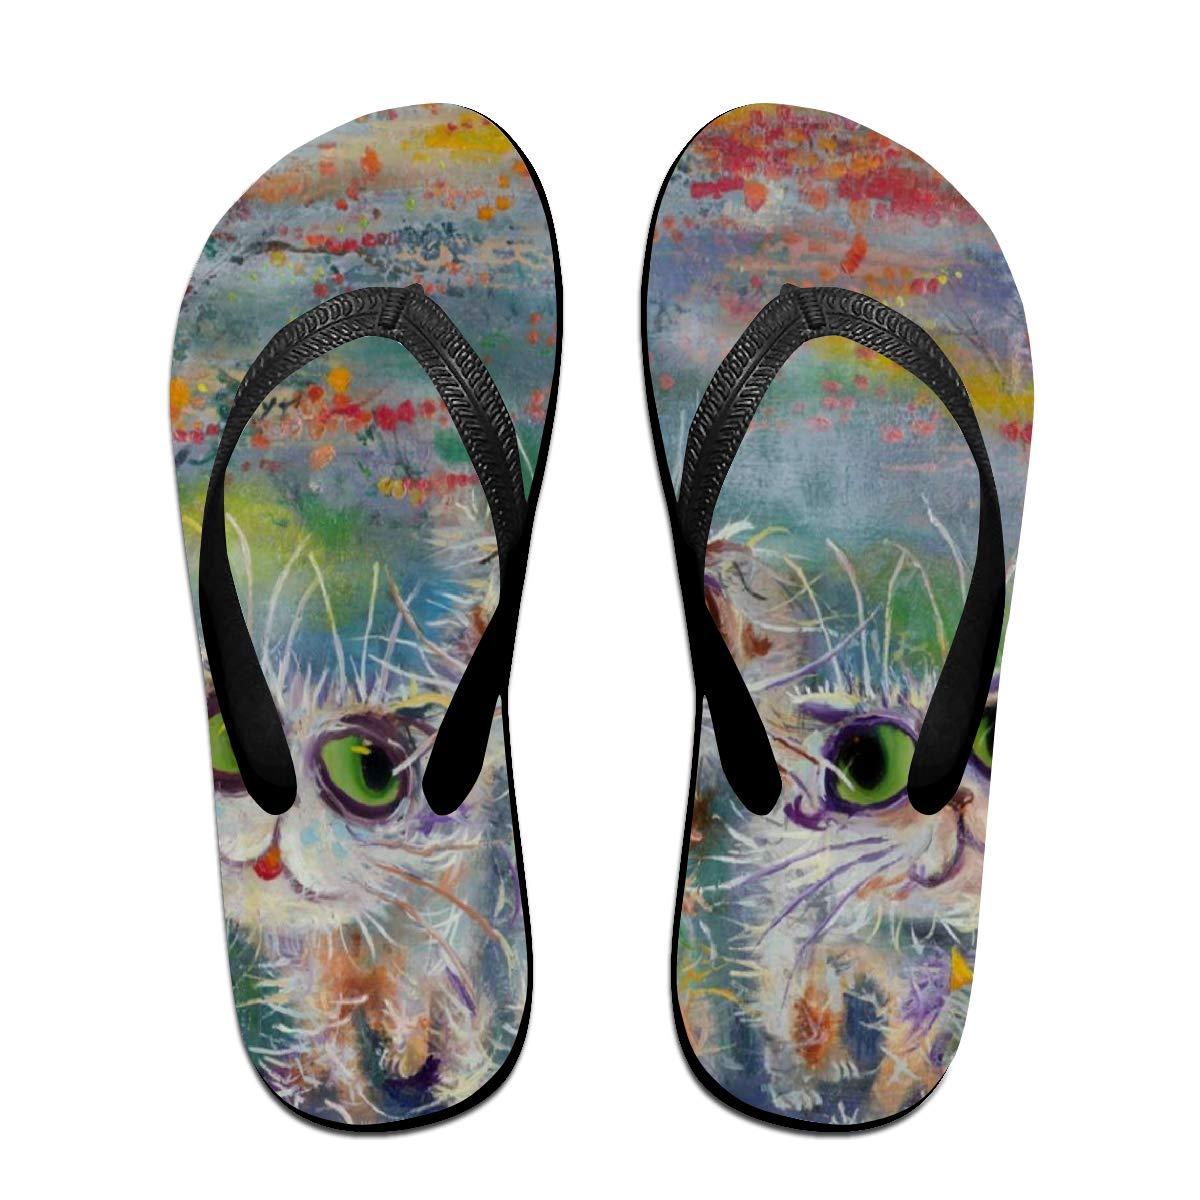 Flip Flops Artwork Painting Womens Indoor Slippers Top Sandals for Woman